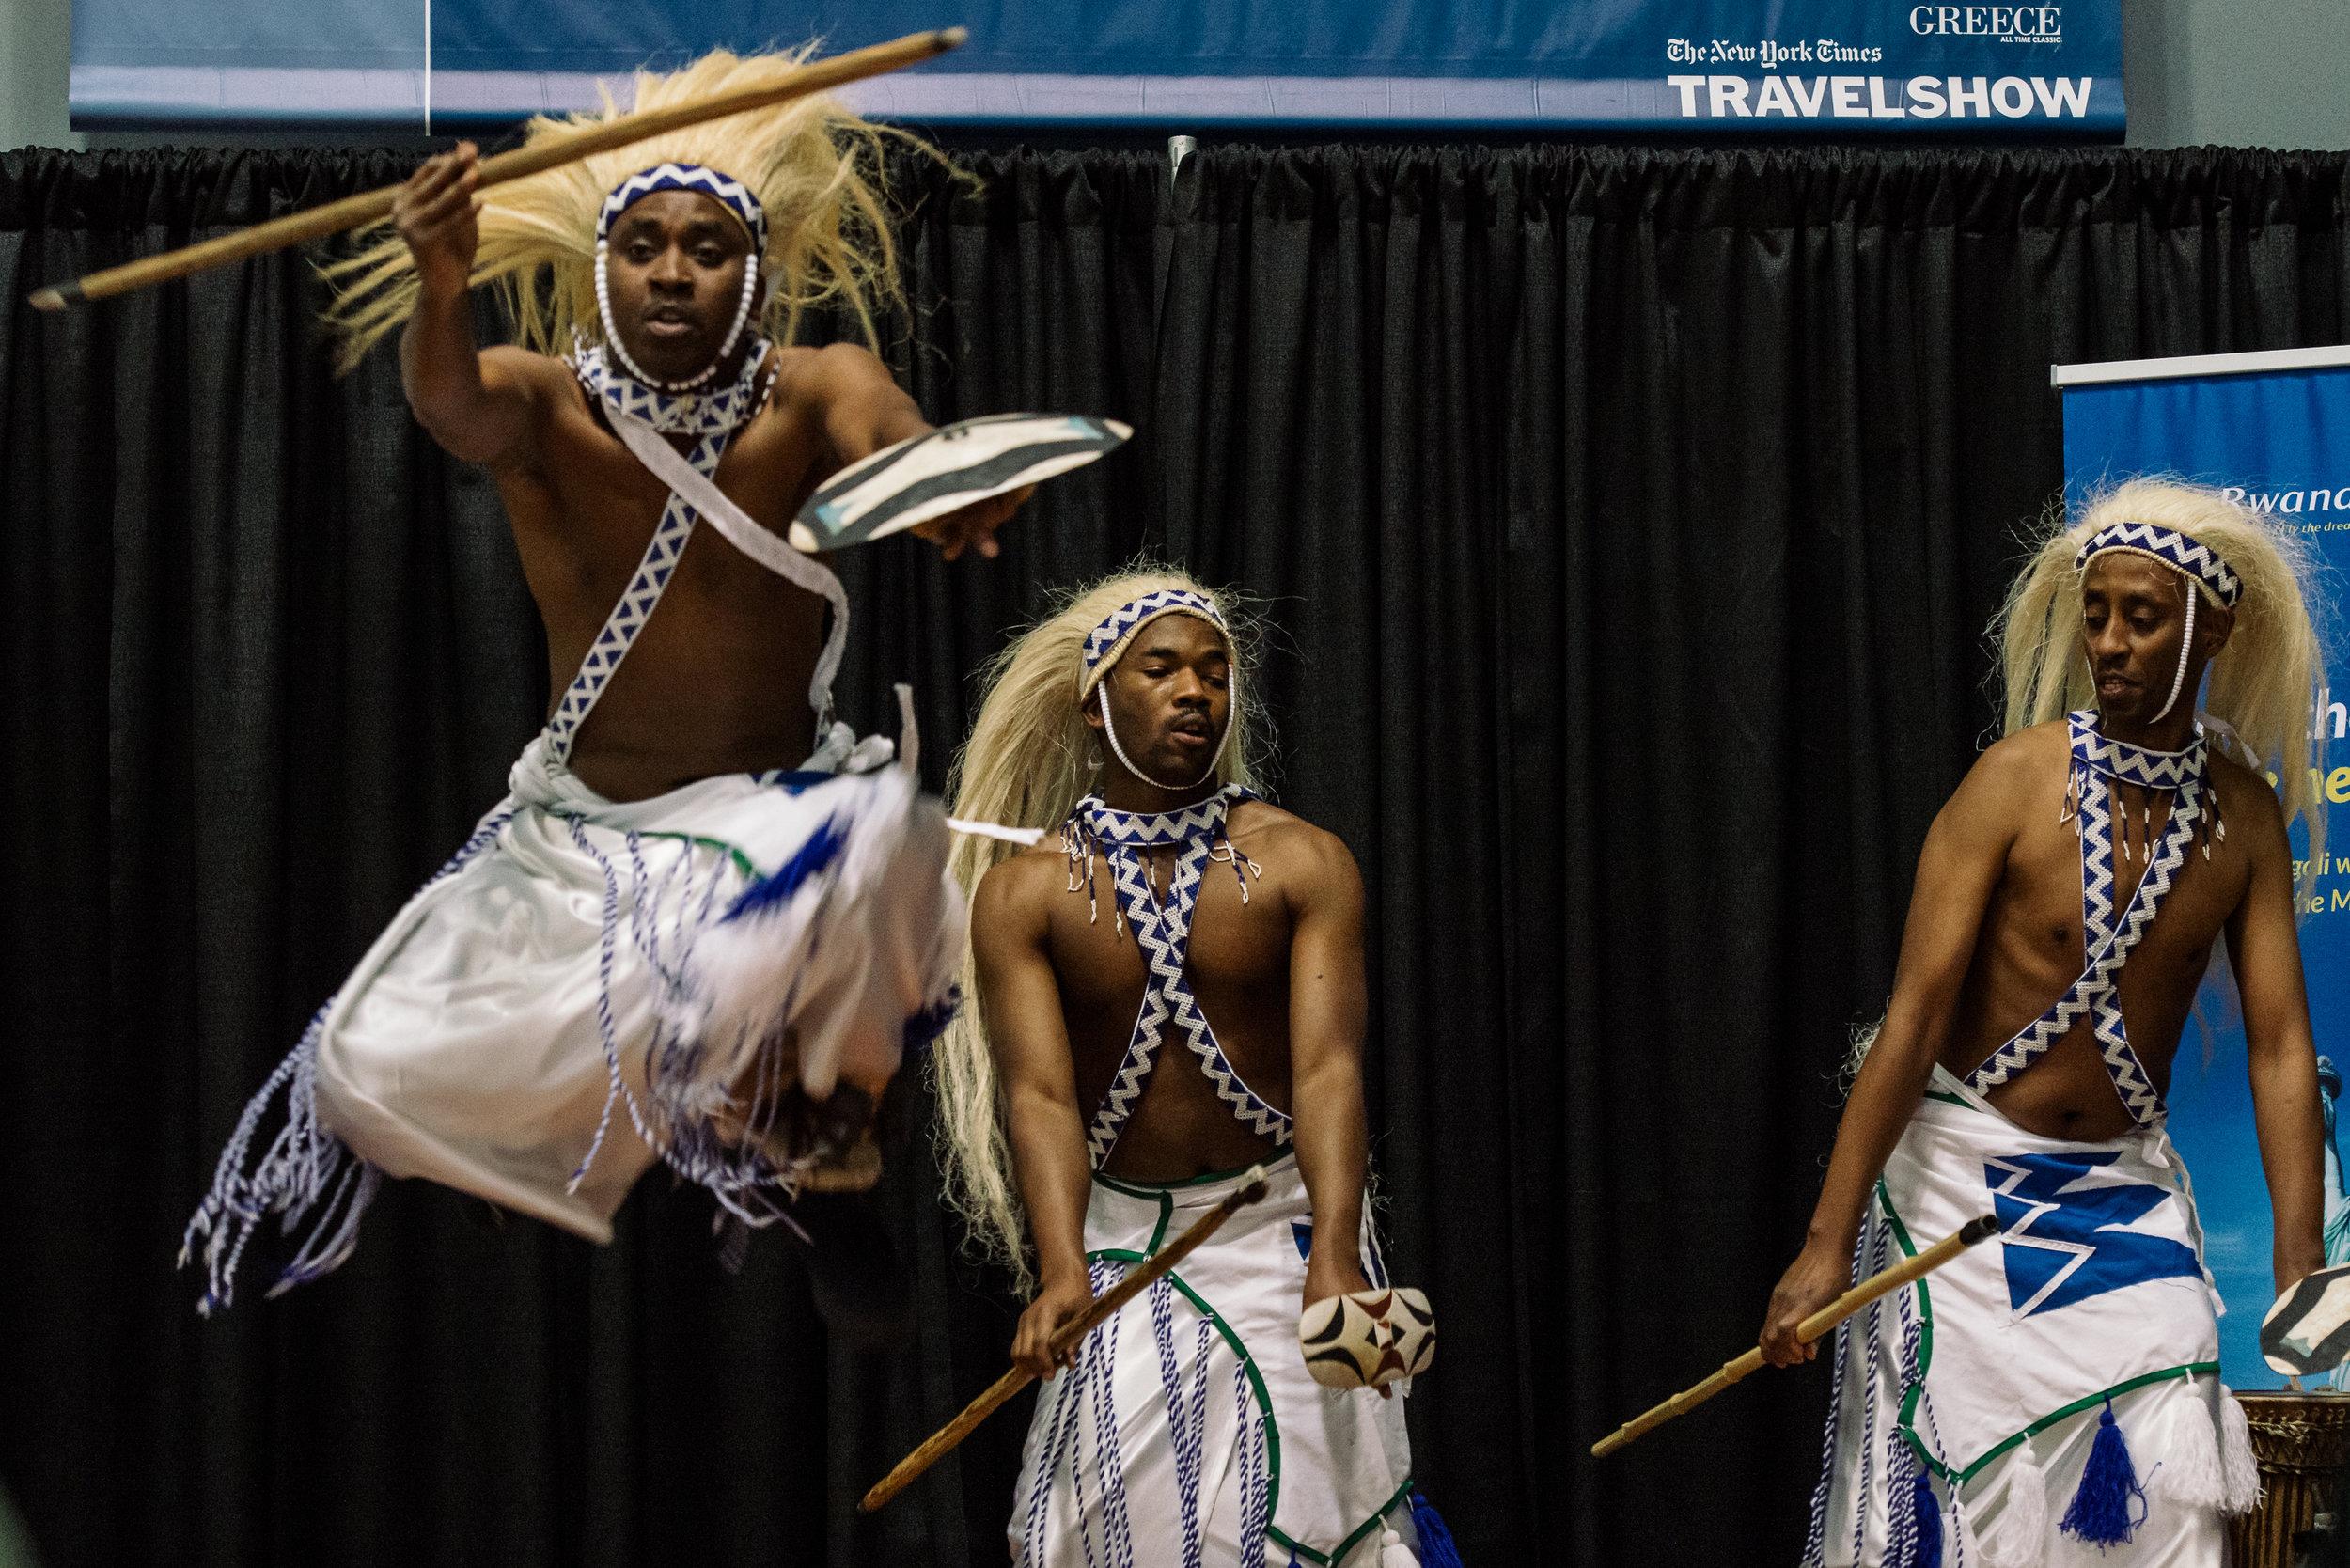 20170128-rwanda-travel-expo-6105.jpg